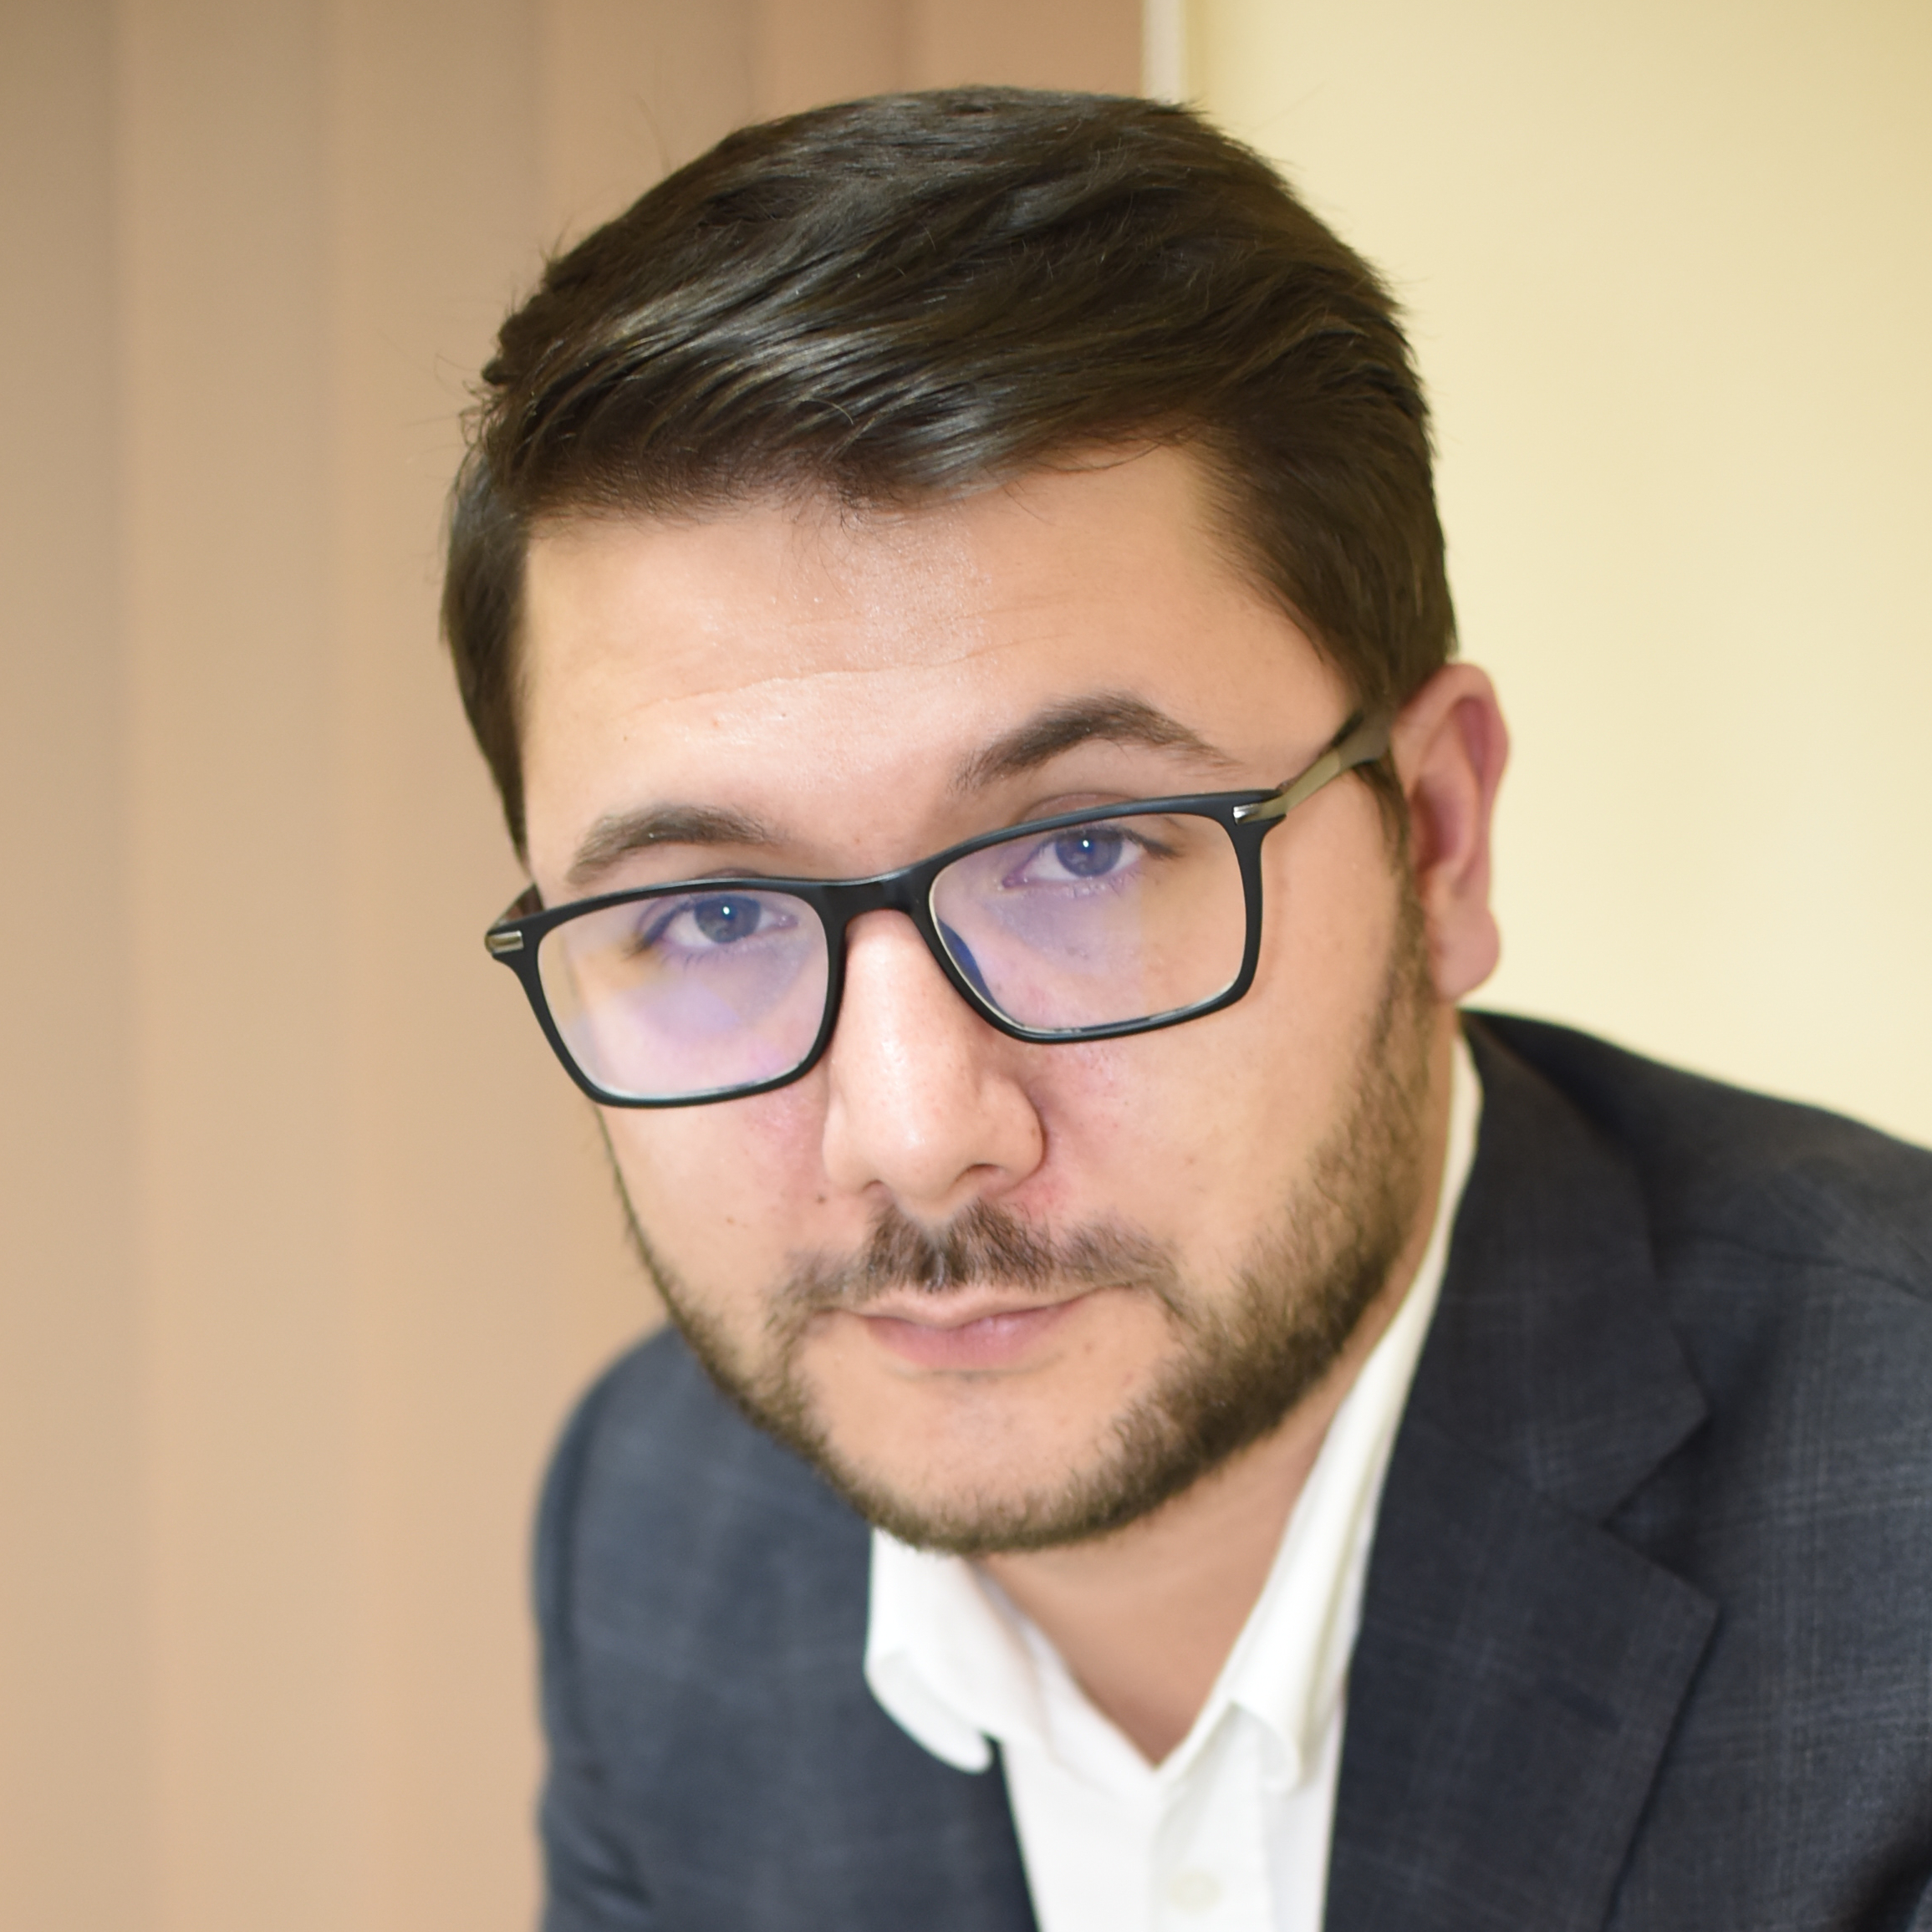 Иван Шаховцев ИНРАПС